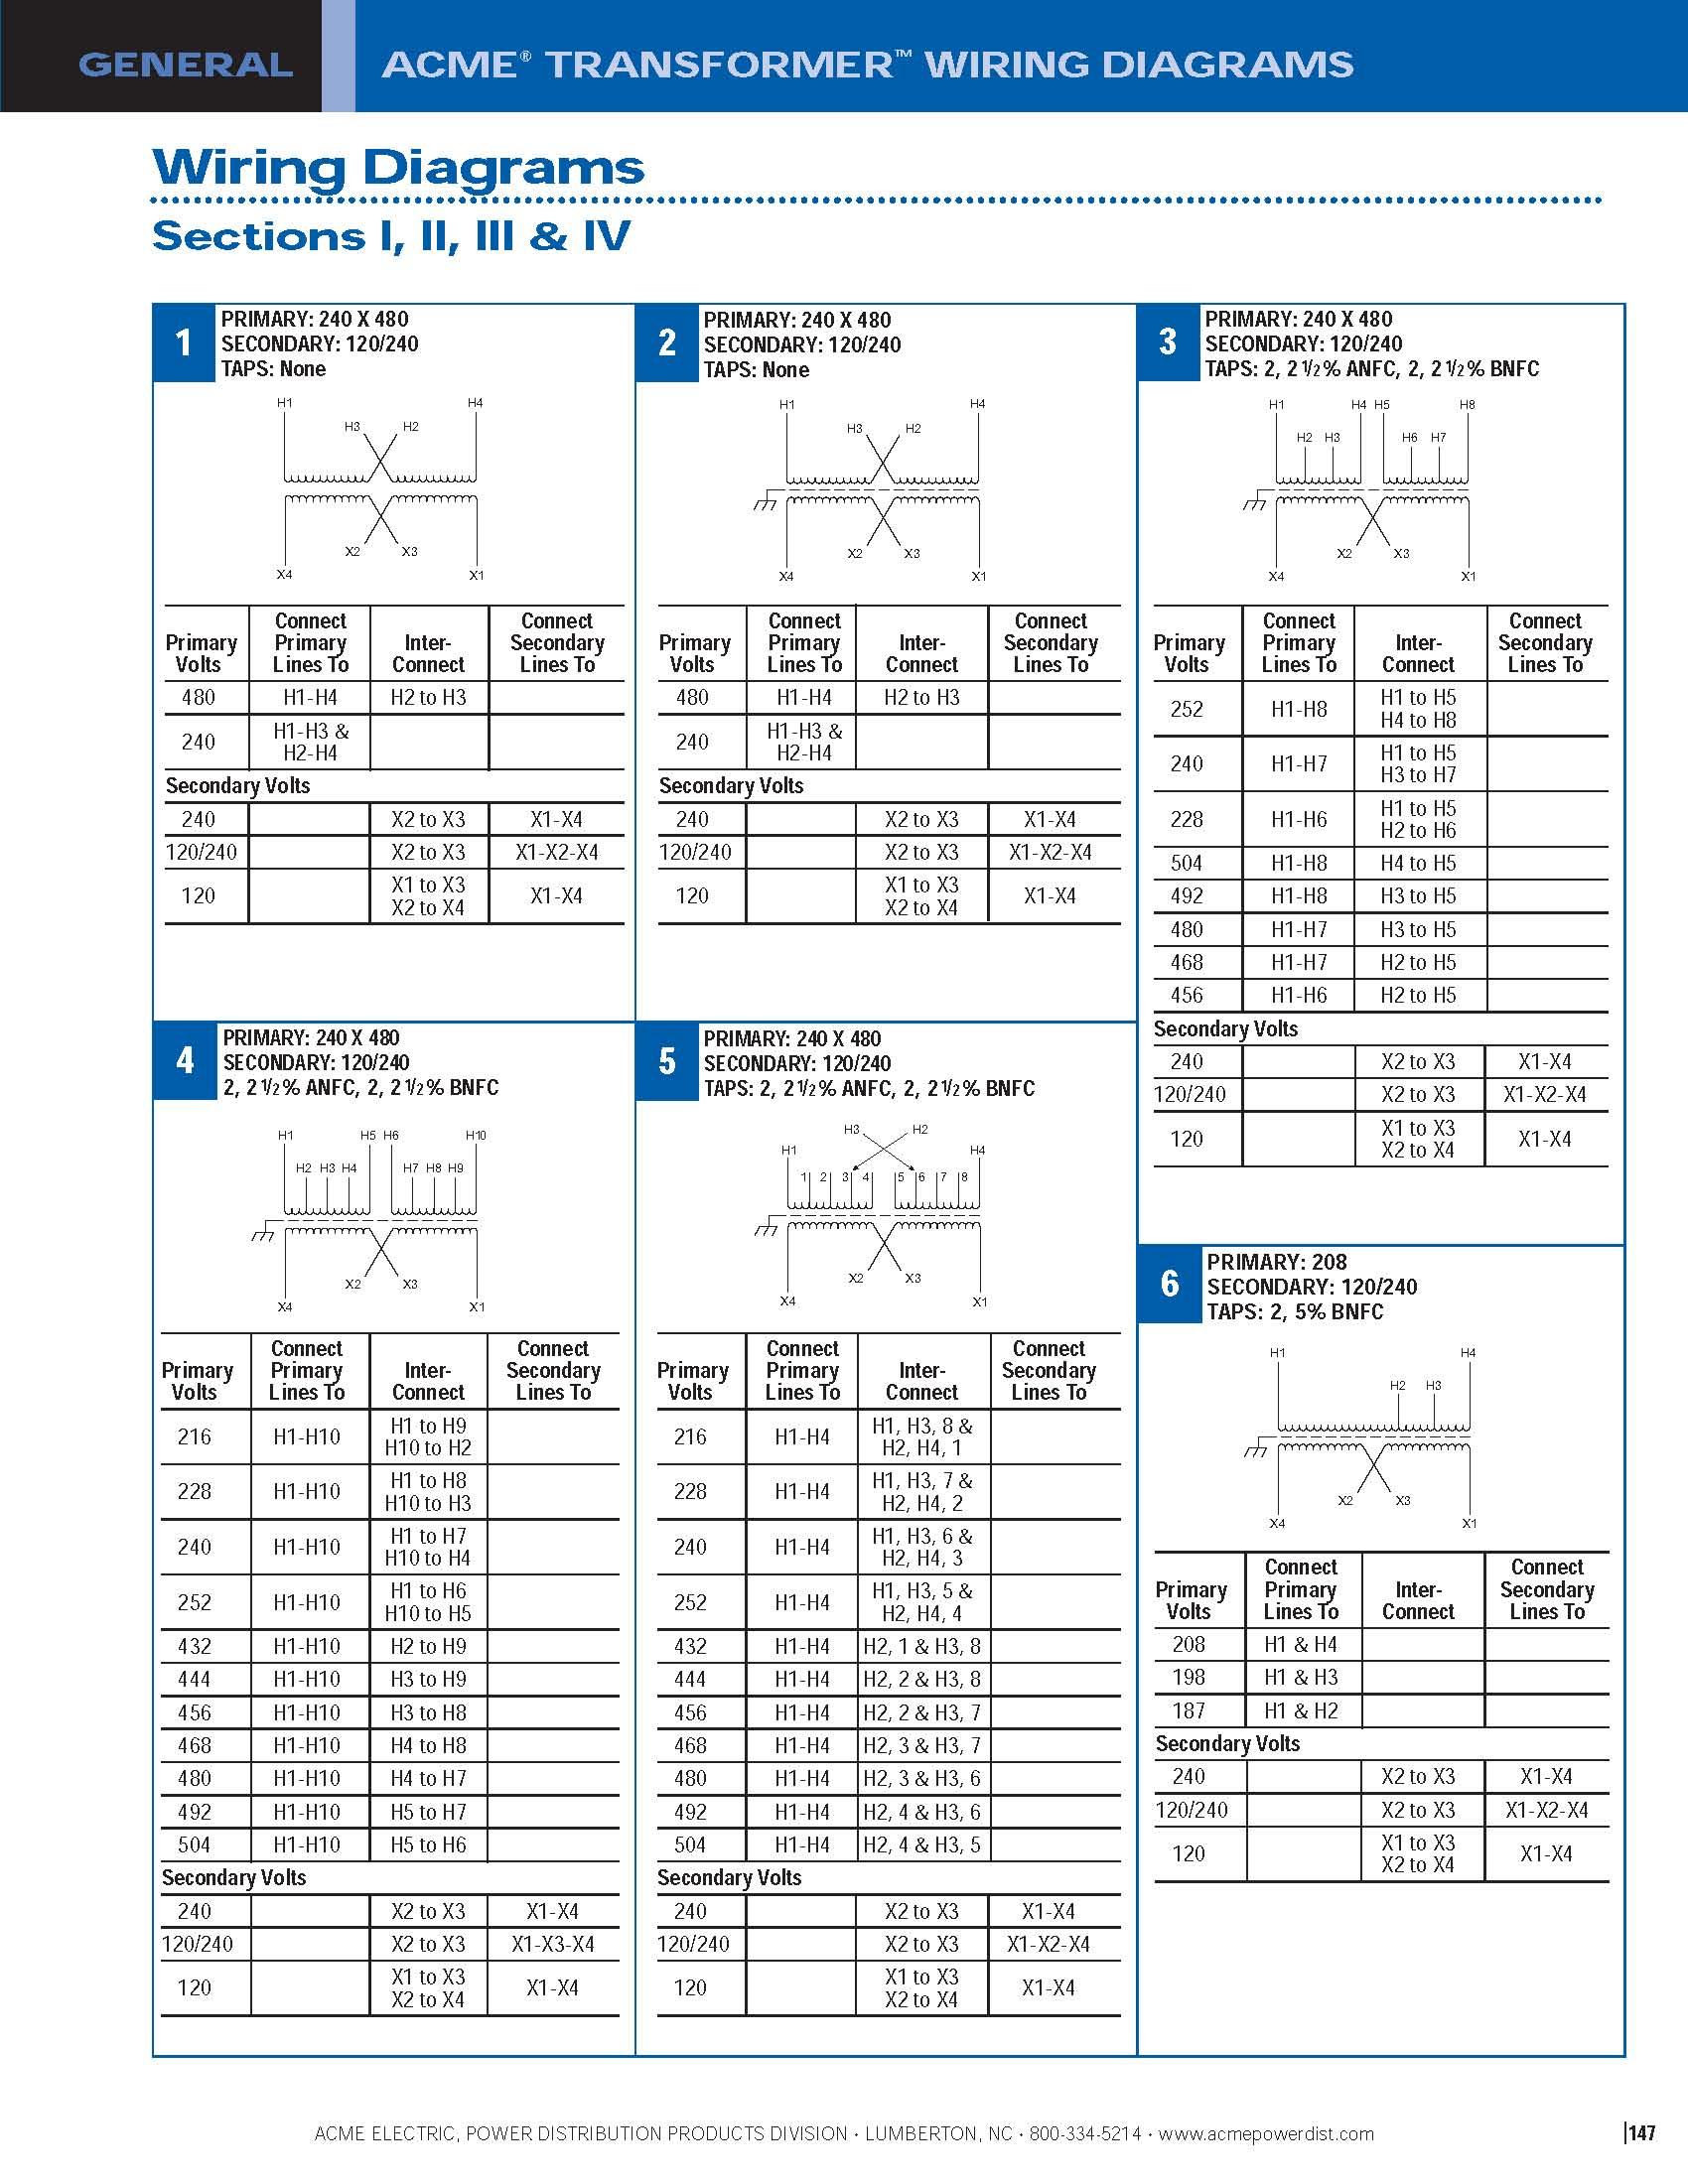 Acme Buck Boost Transformer Wiring - Data Wiring Diagram Site - Buck Boost Transformer Wiring Diagram